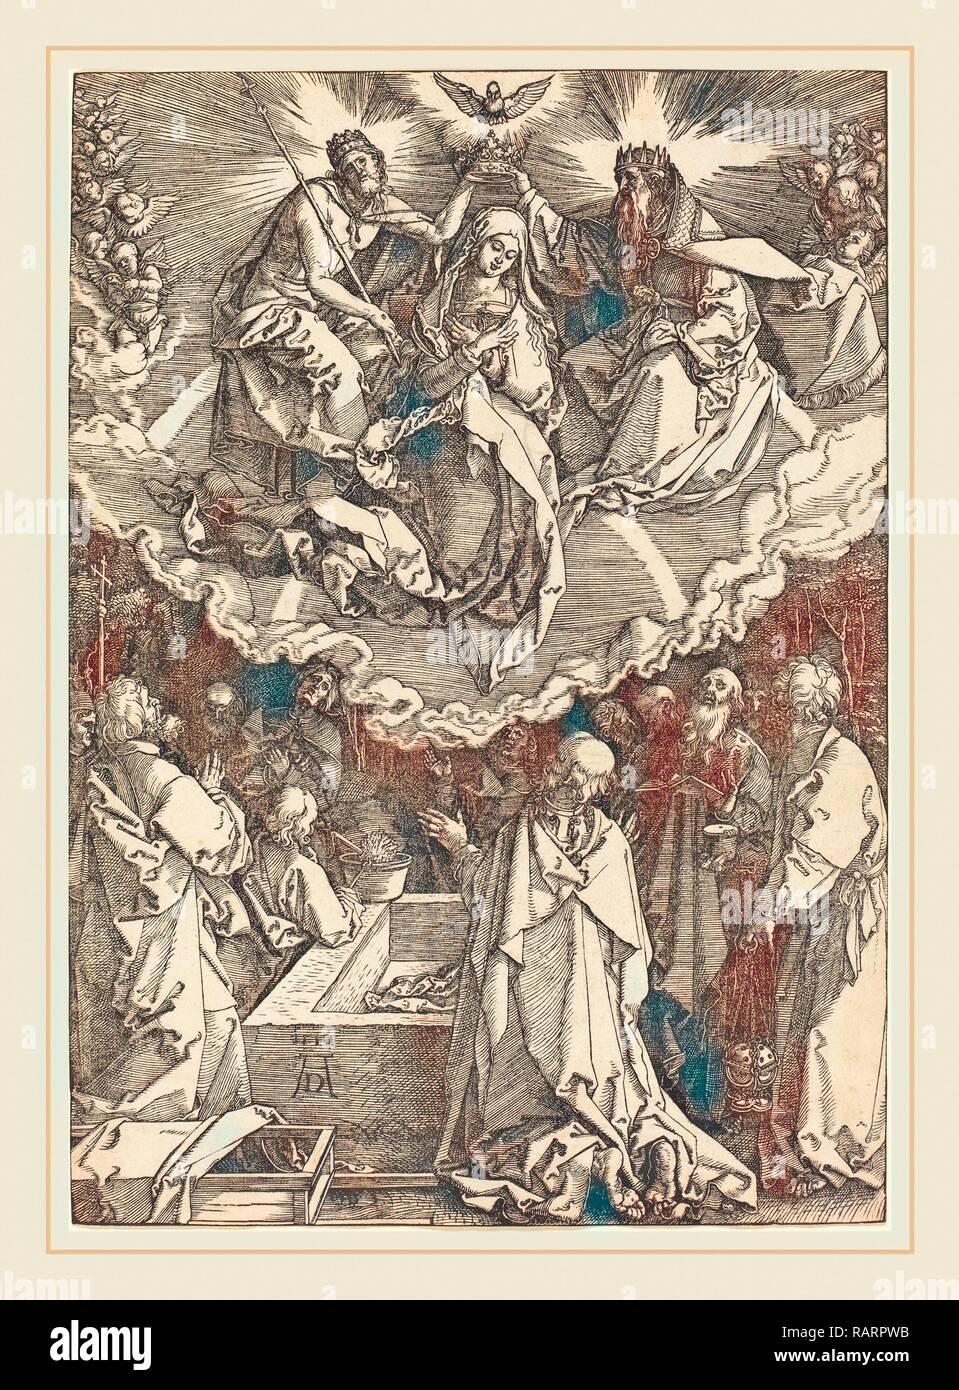 Albrecht Dürer (1471-1528), Mariä Himmelfahrt und Krönung der Jungfrau, 1510, Holzschnitt. Neuerfundene Stockbild